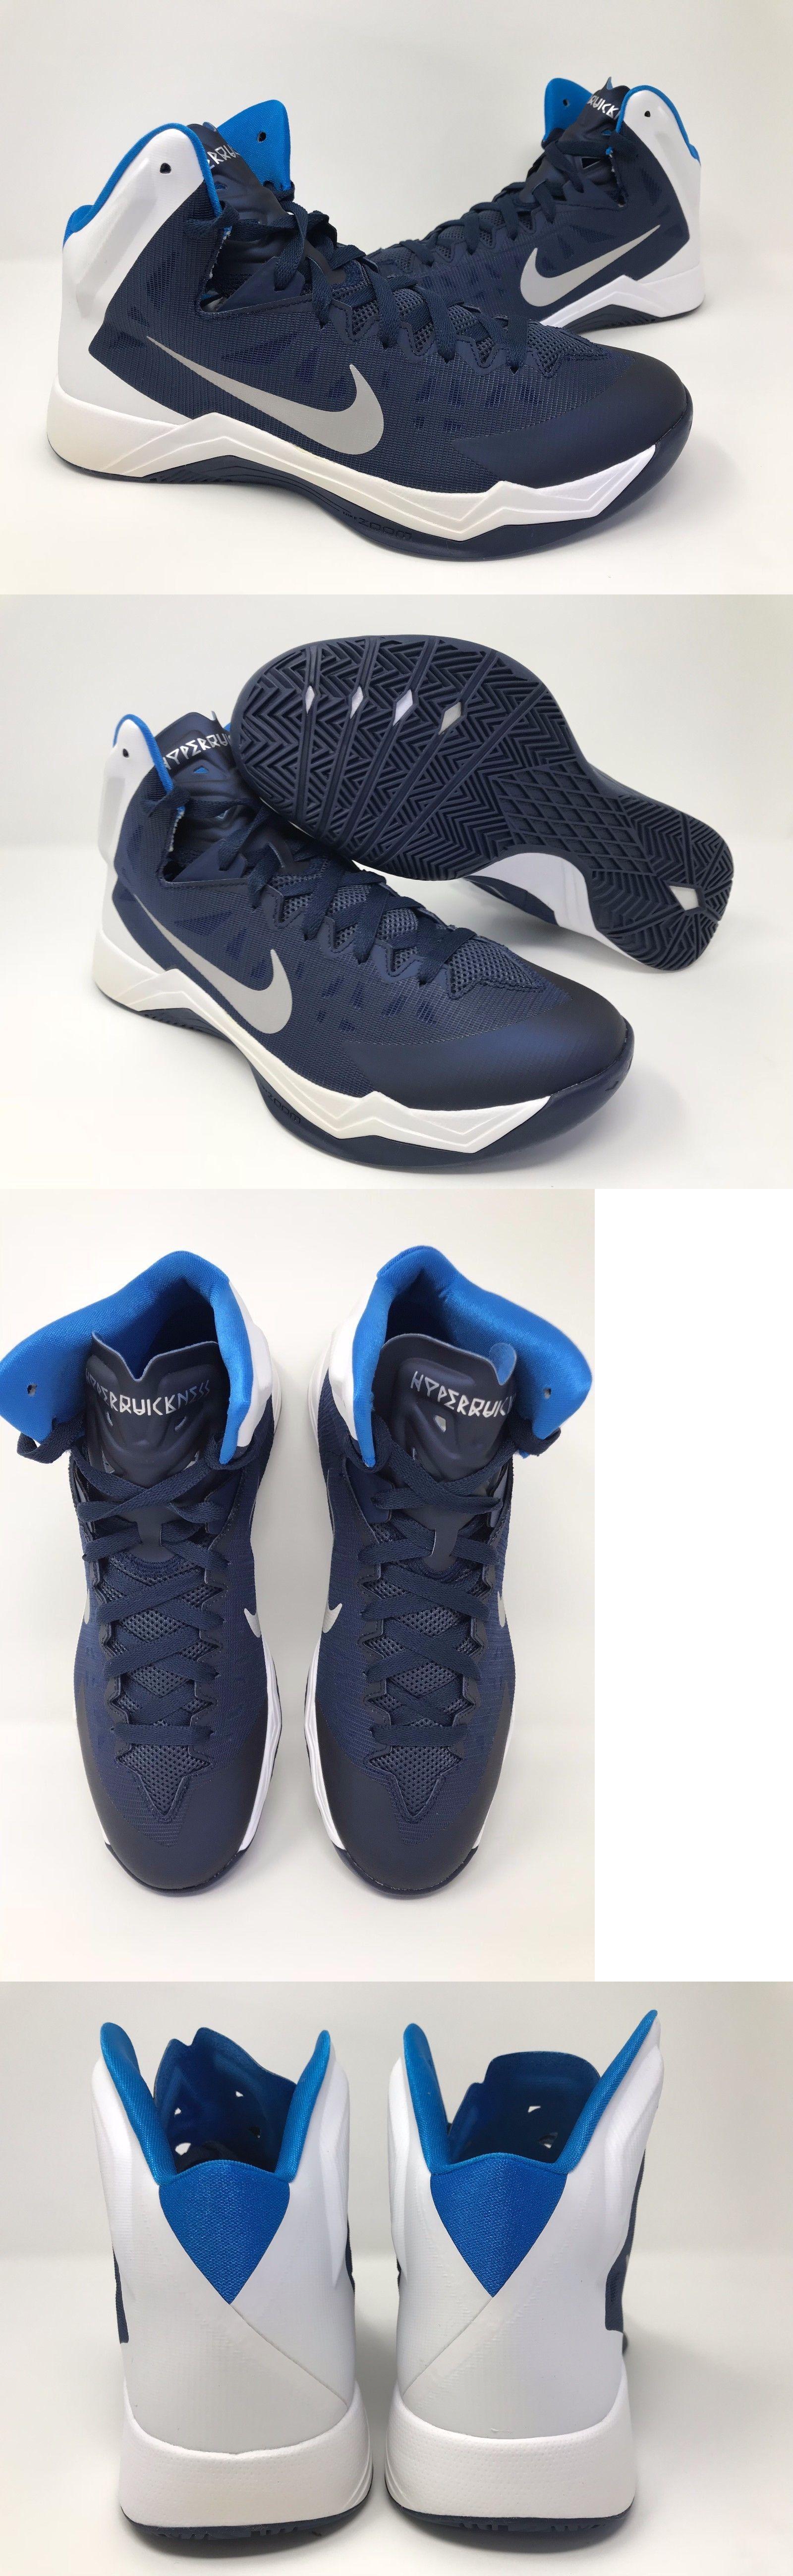 Women S Nike Zm Hyperquickness Tb 599515 402 -. Basketball Shoes